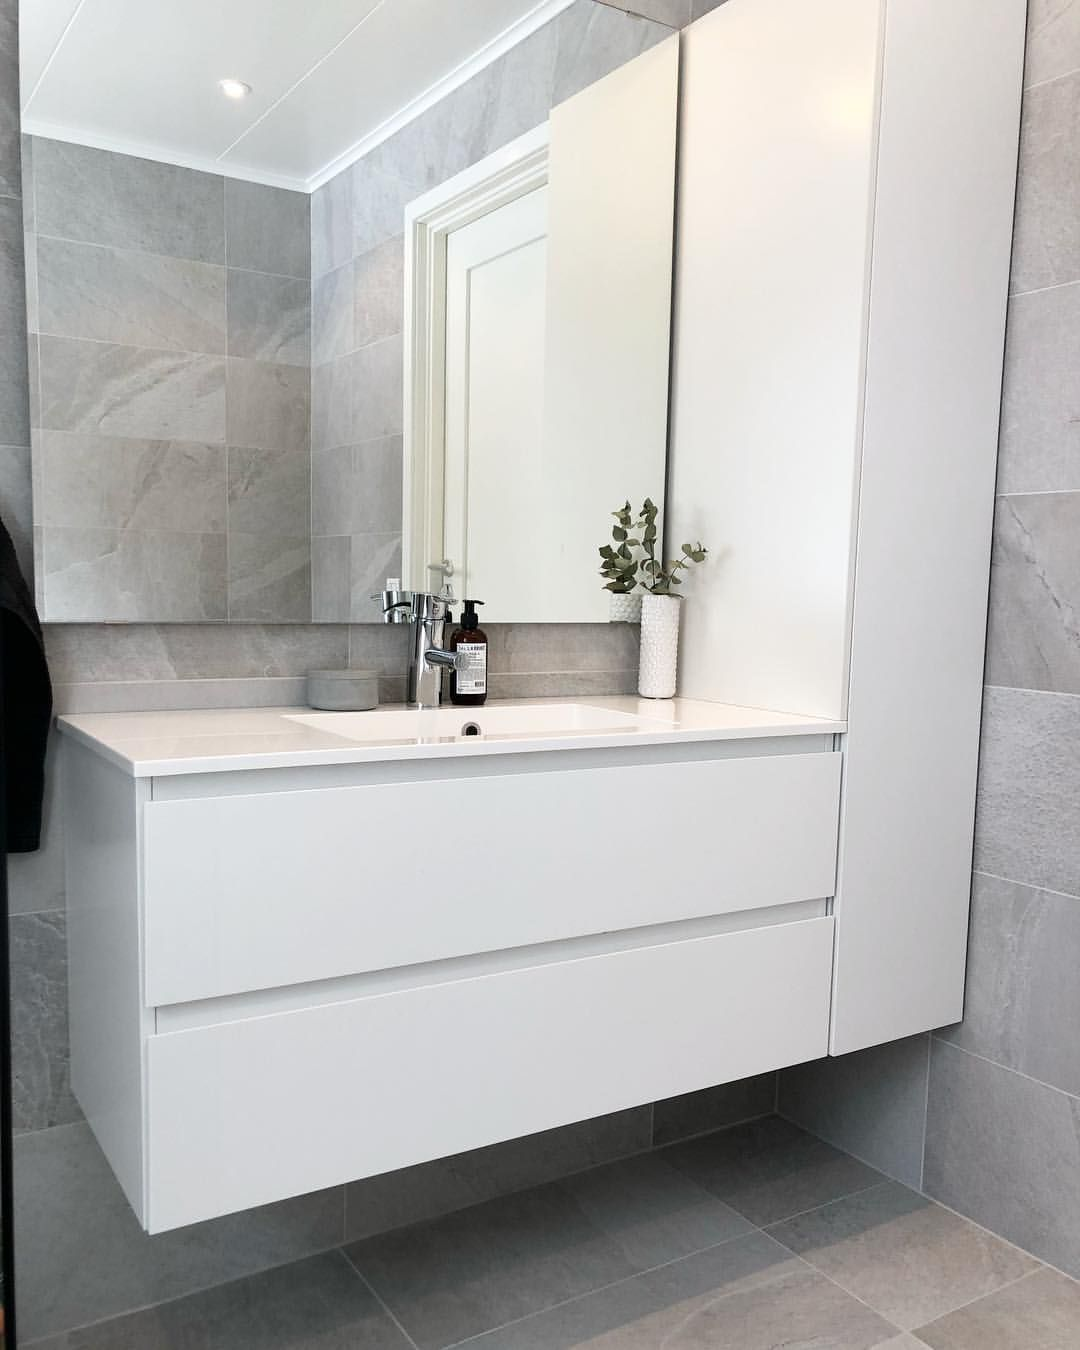 Isabella On Instagram F R I Y A Y Badrumsinspo Badrum Inspohome Inredningsinspo Inr In 2020 Washroom Design Bathroom Inspiration Modern Bathroom Interior